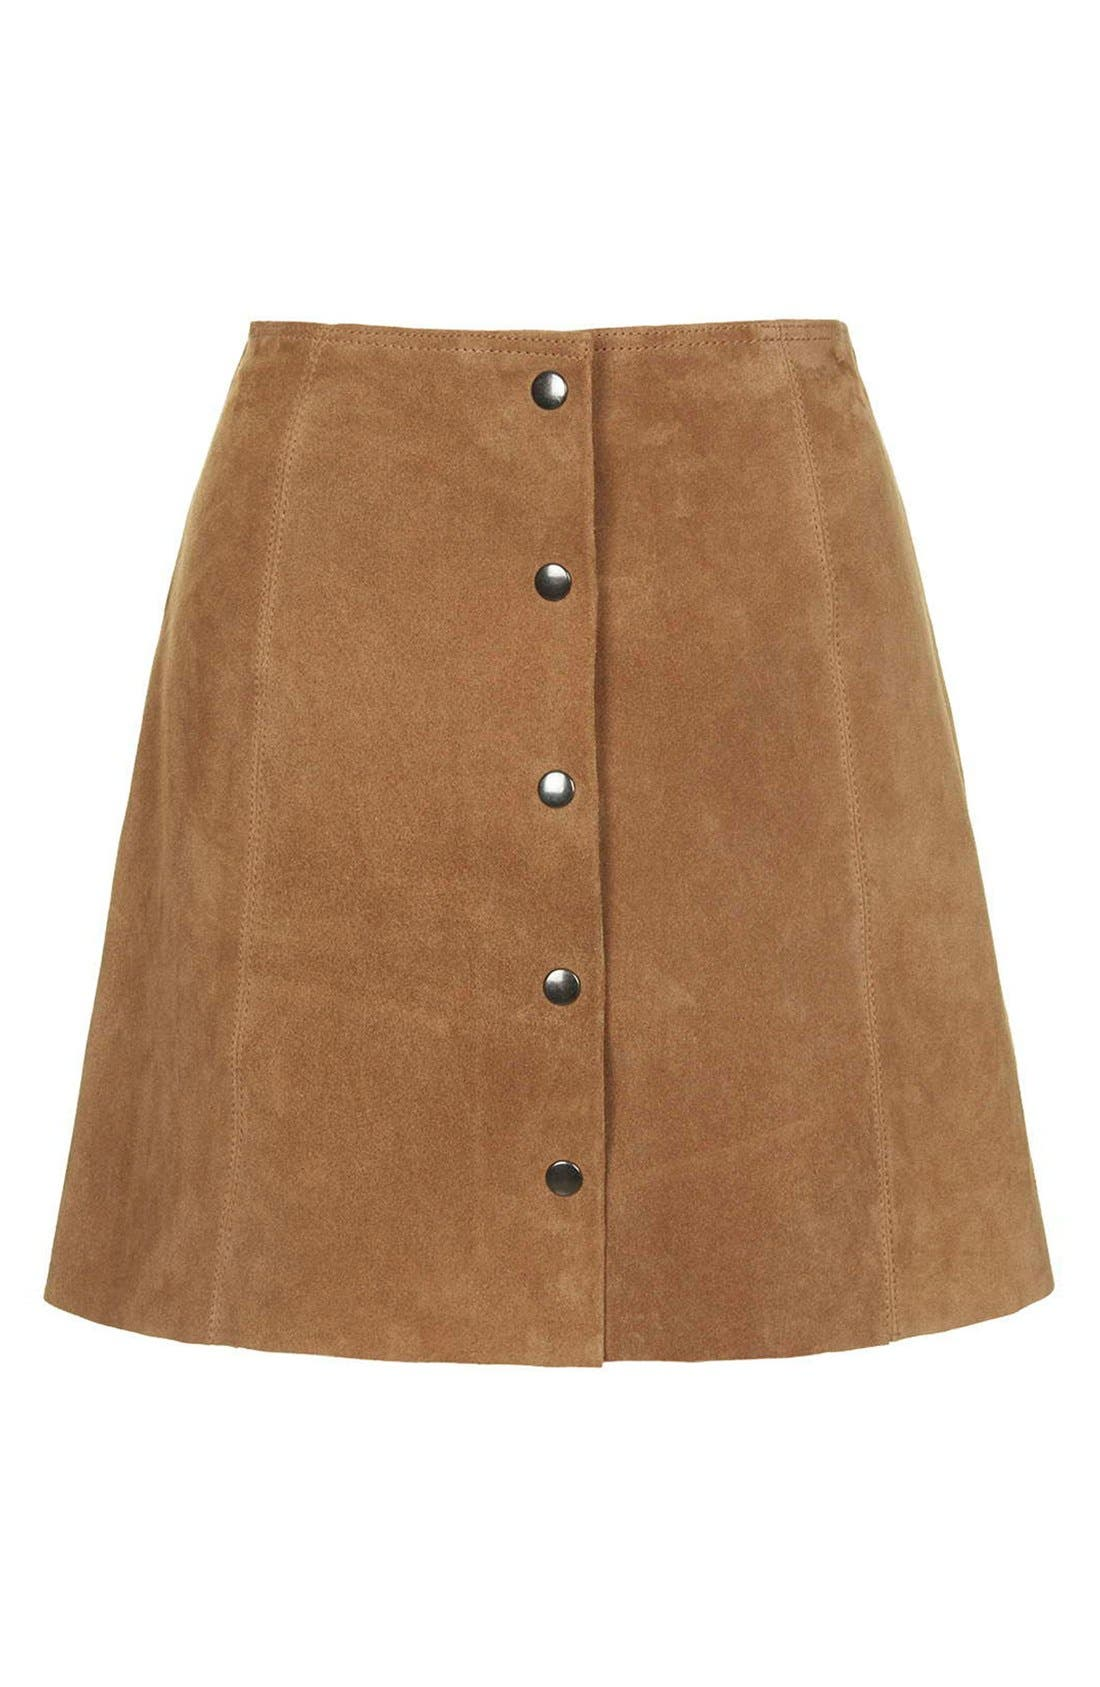 Alternate Image 3  - Topshop Suede A-Line Skirt